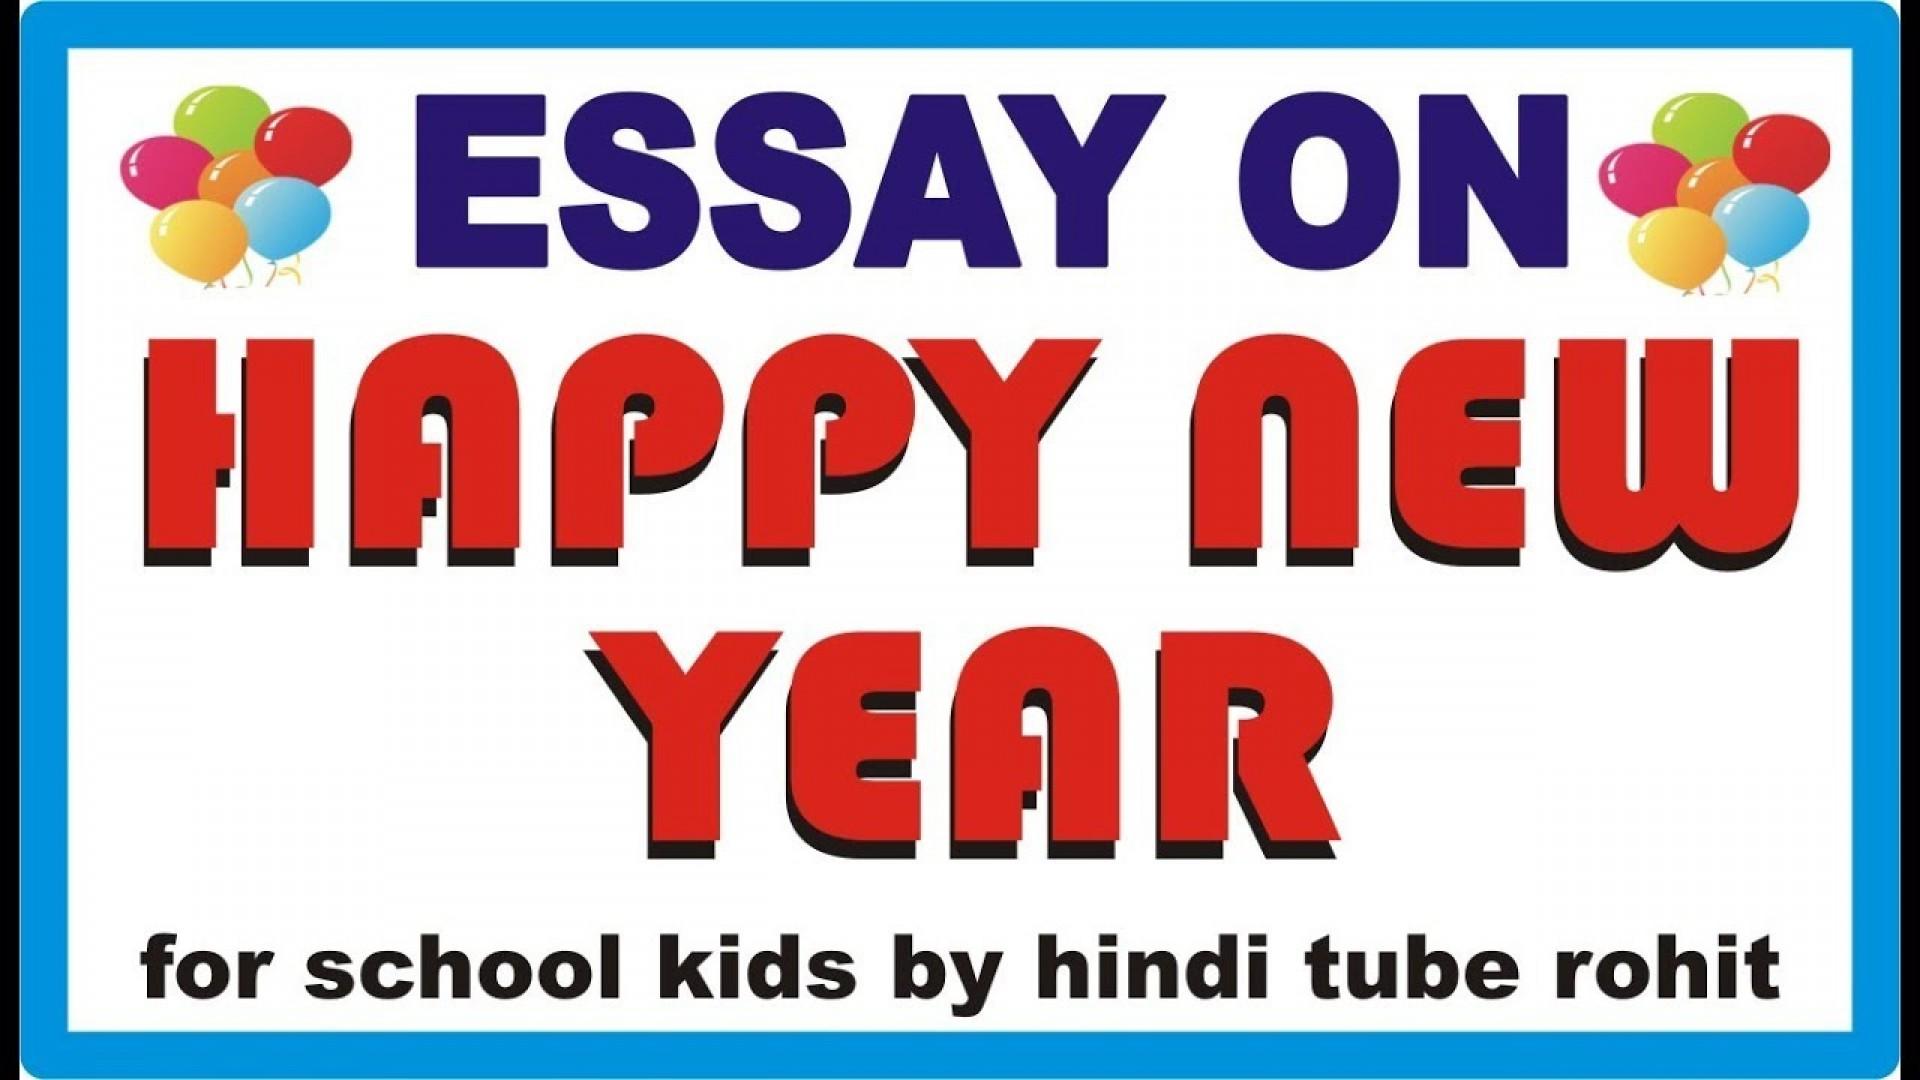 013 Maxresdefault New Year Essay Stirring Chinese Introduction Bengali In Hindi Malayalam 1920